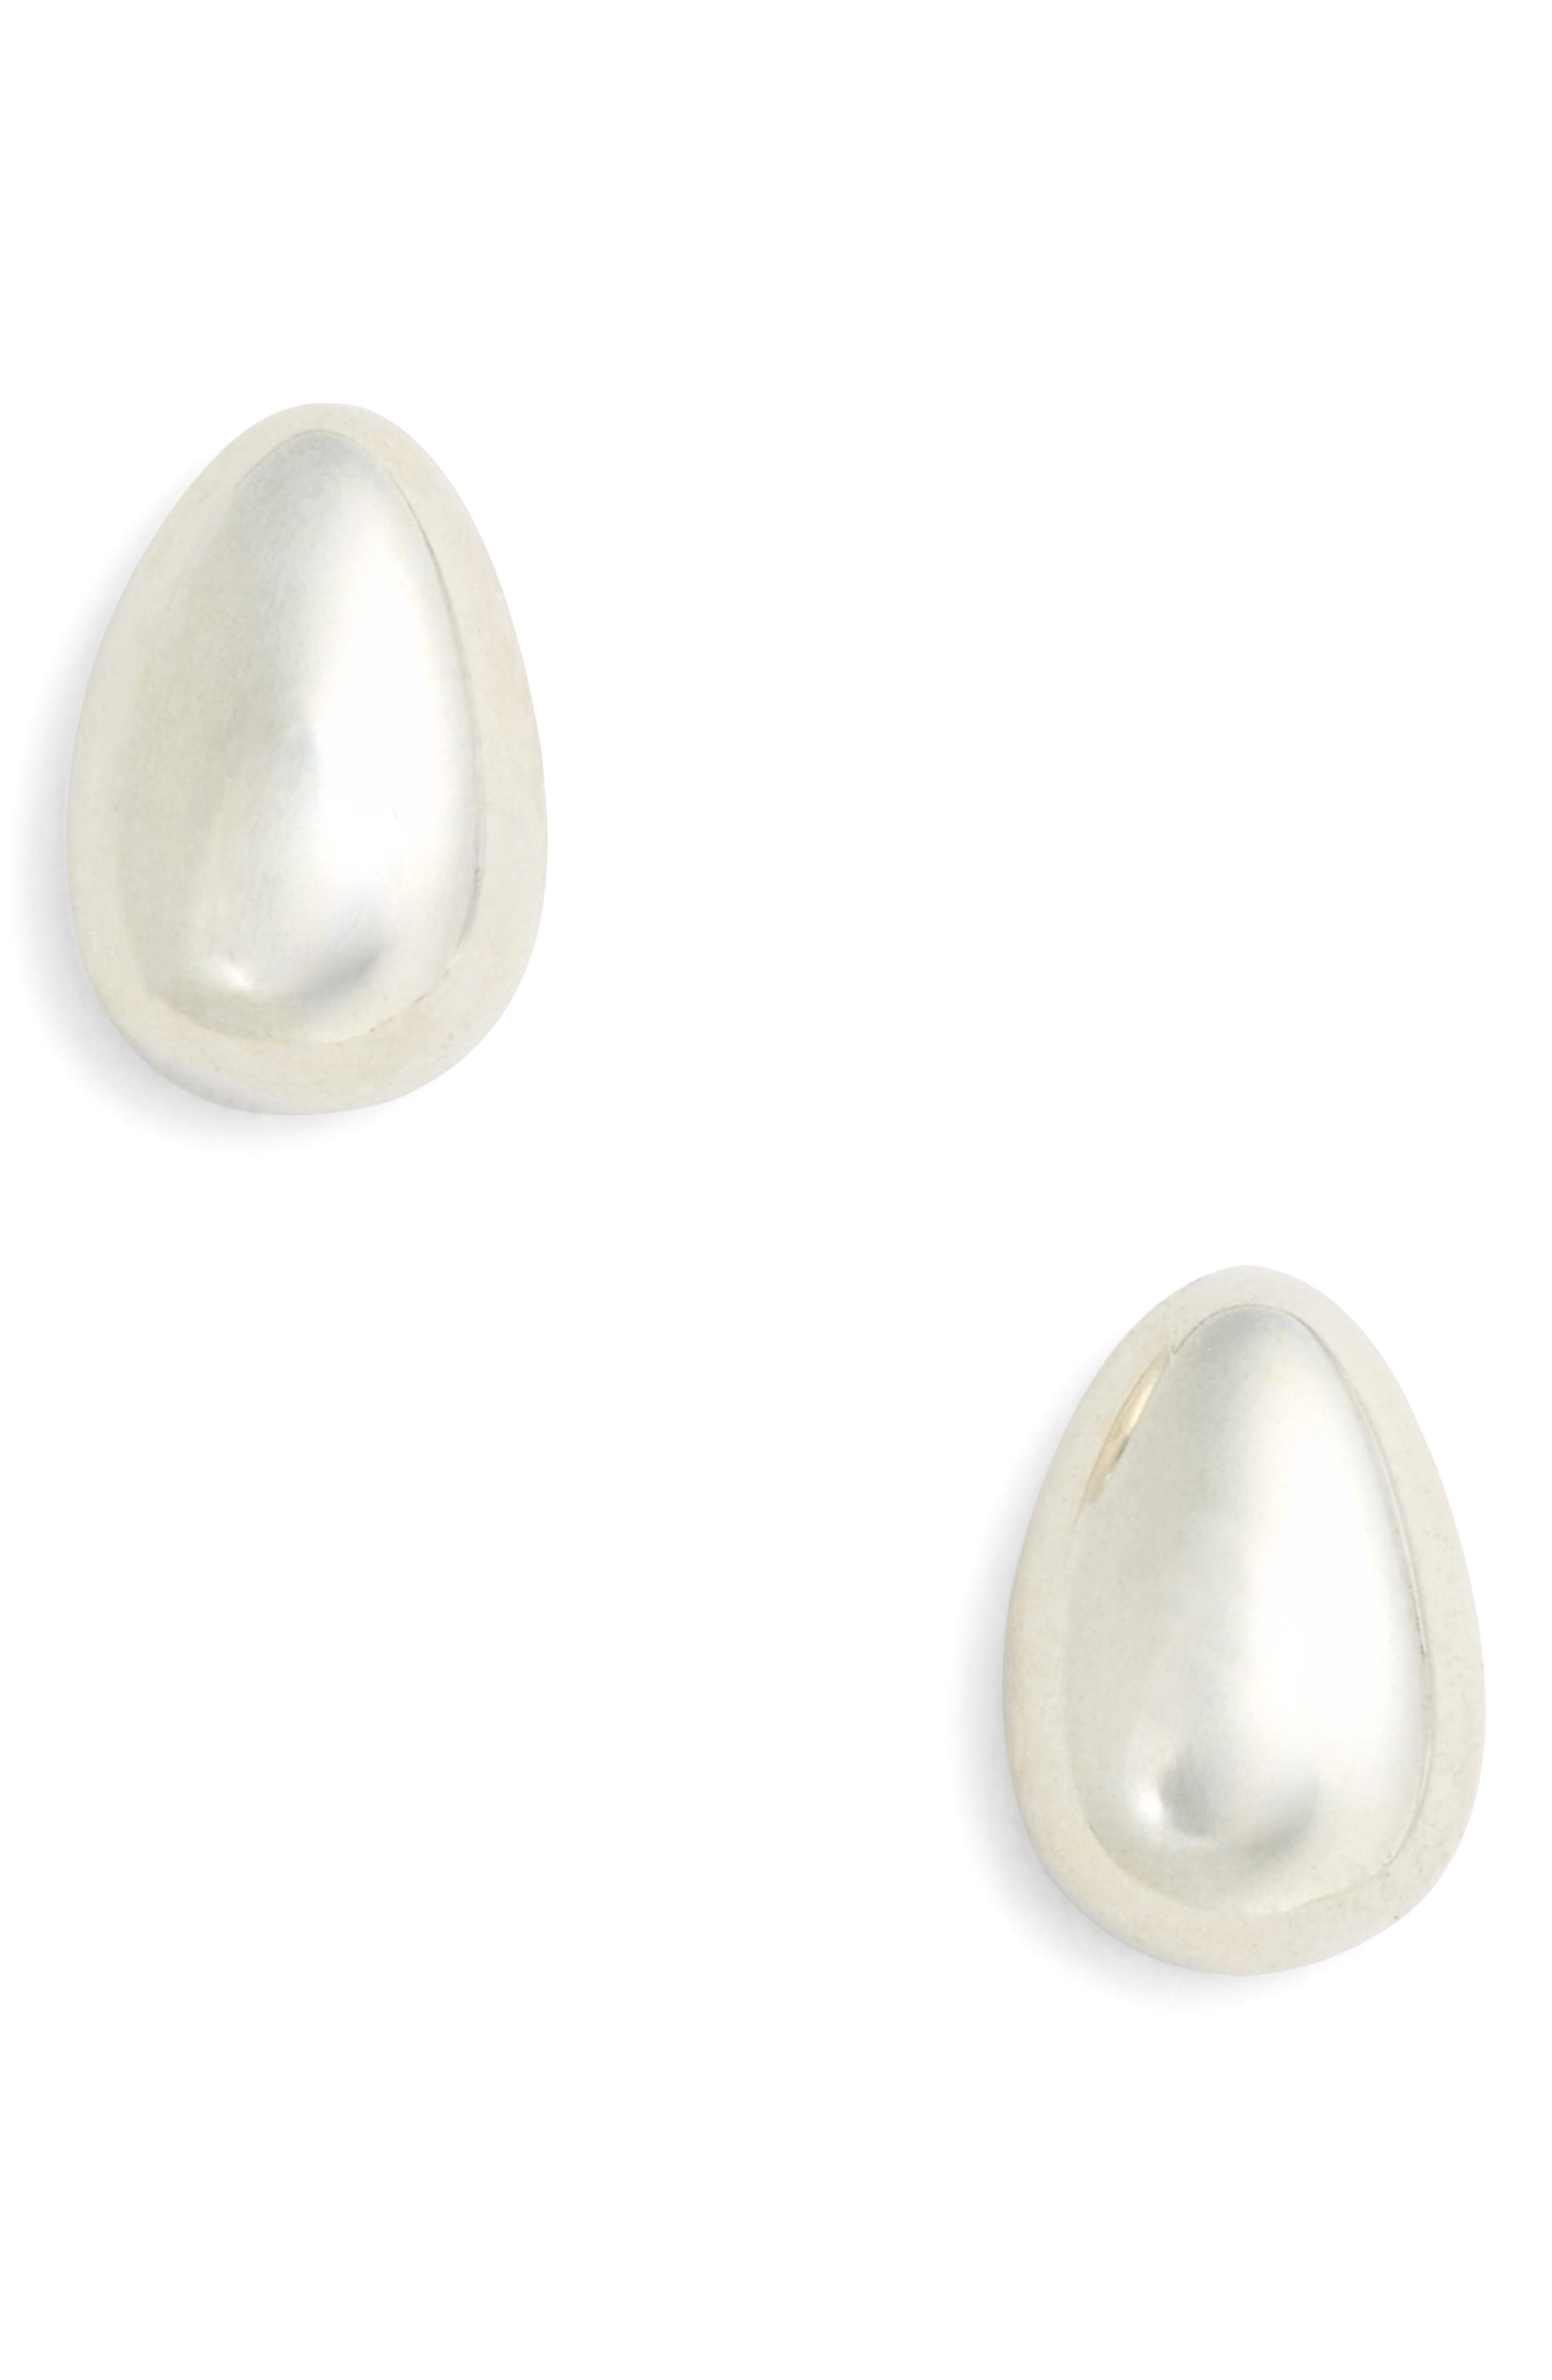 Main Image - Sophie Buhai Tiny Egg Stud Earrings